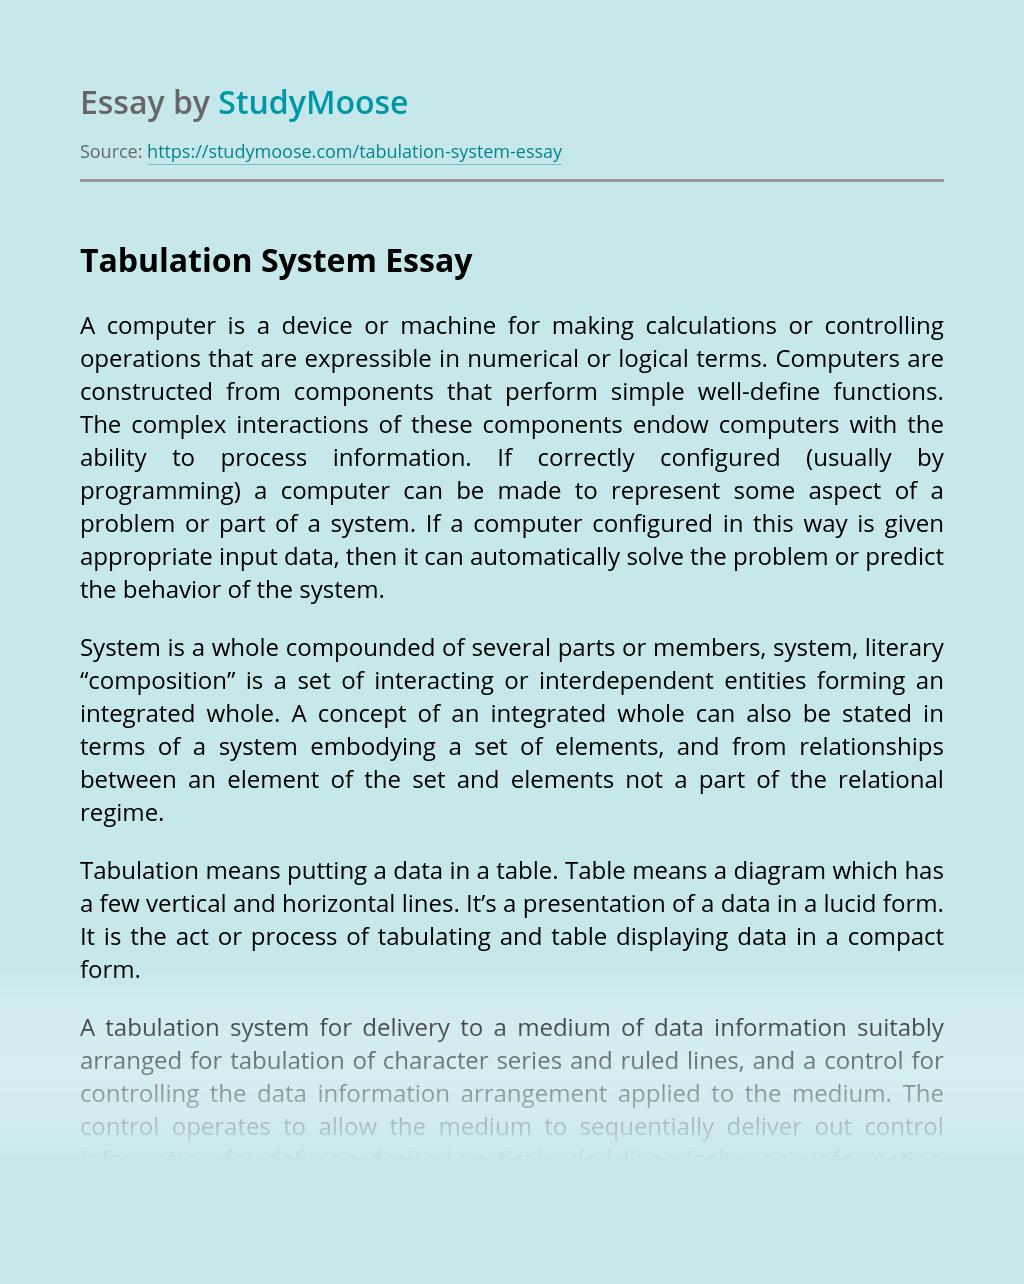 Tabulation System